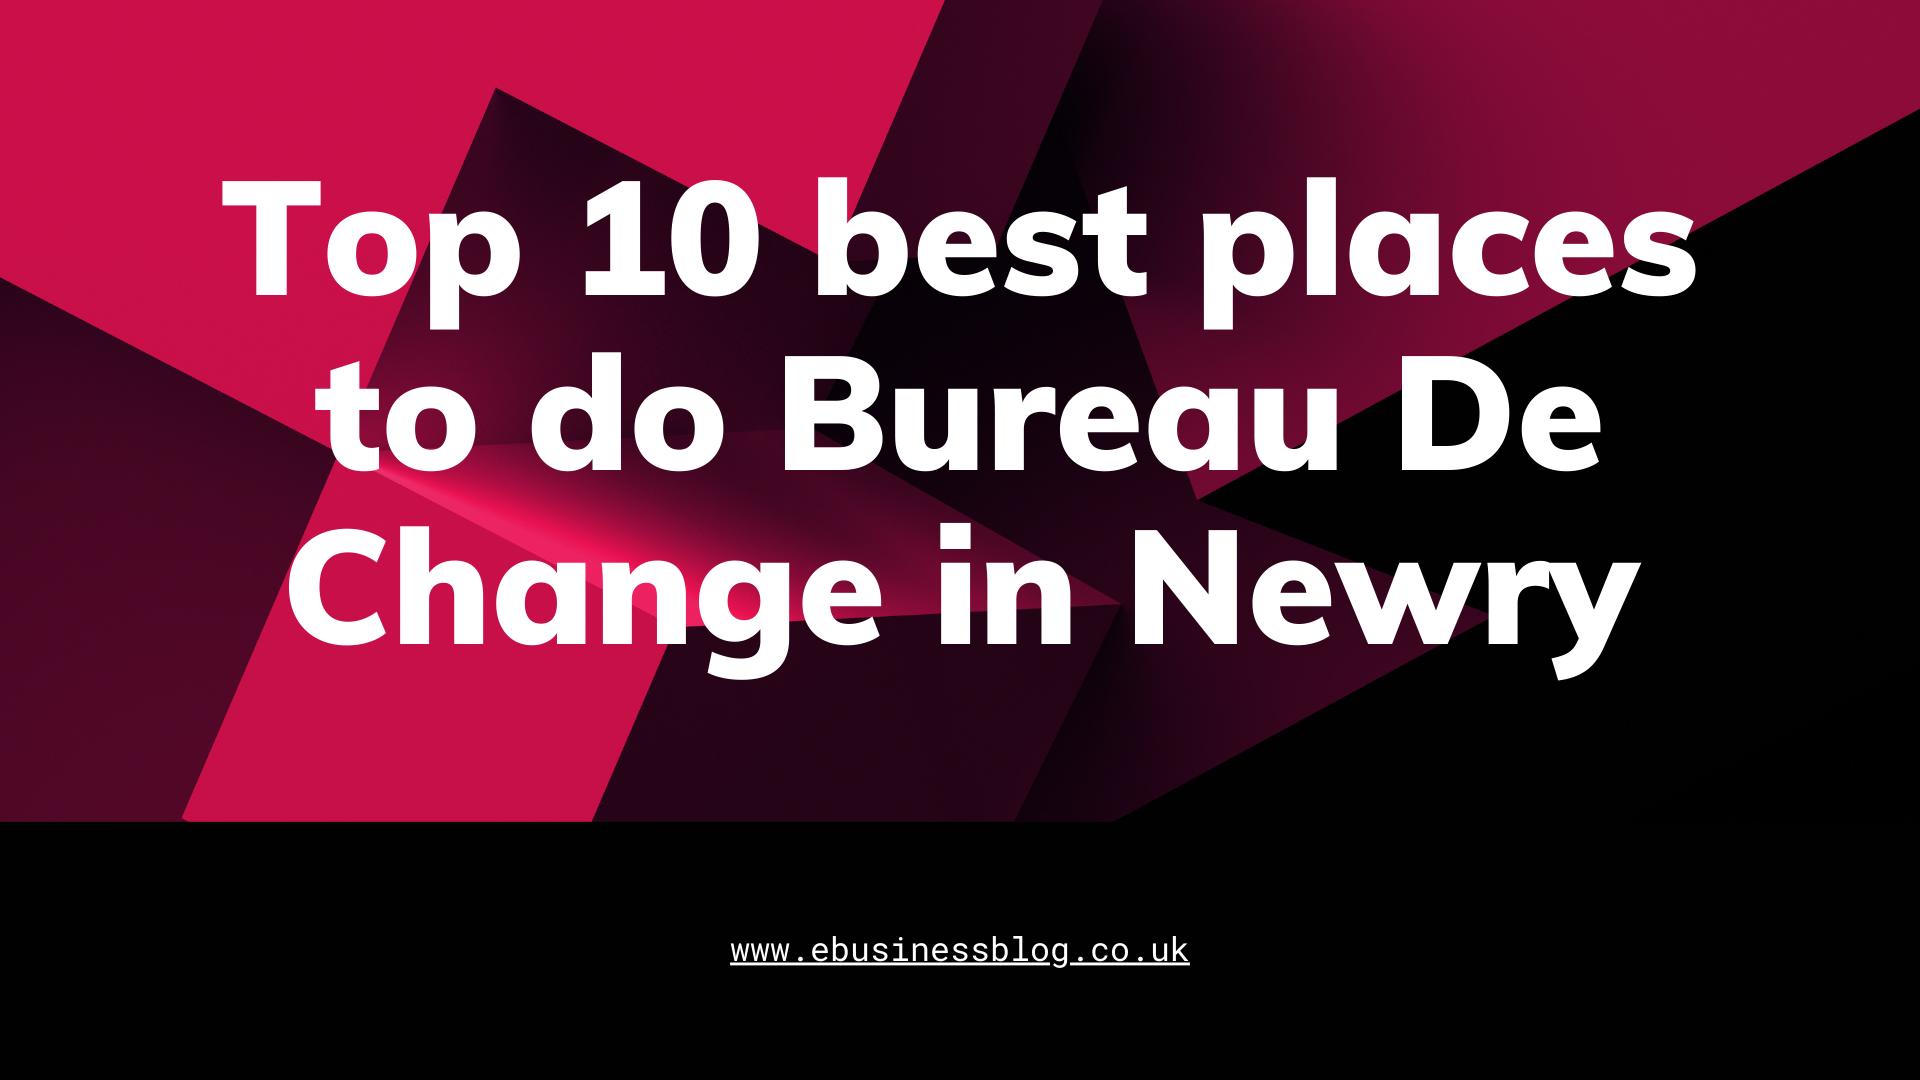 Top 10 best places to do Bureau De Change in Newry